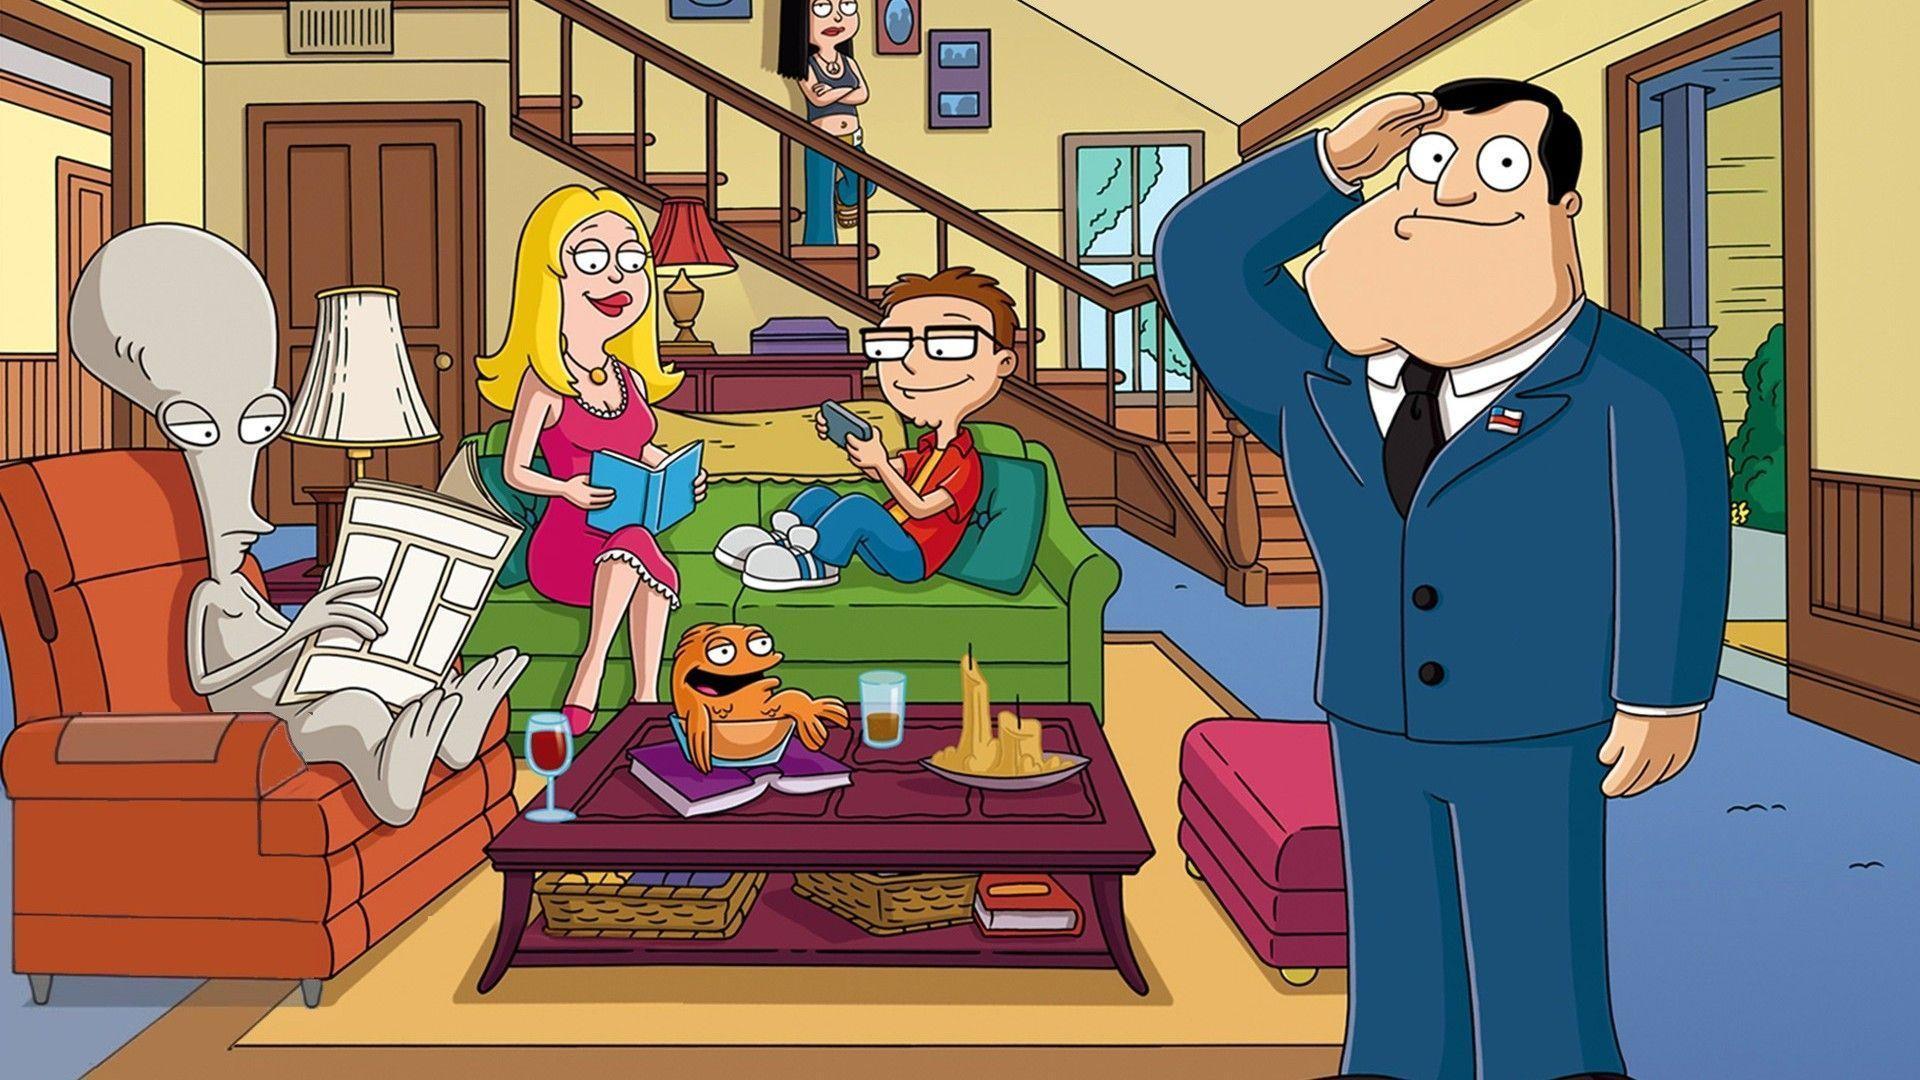 American Dad Season 18 Episode 21 Release Date, Spoilers, And Recap